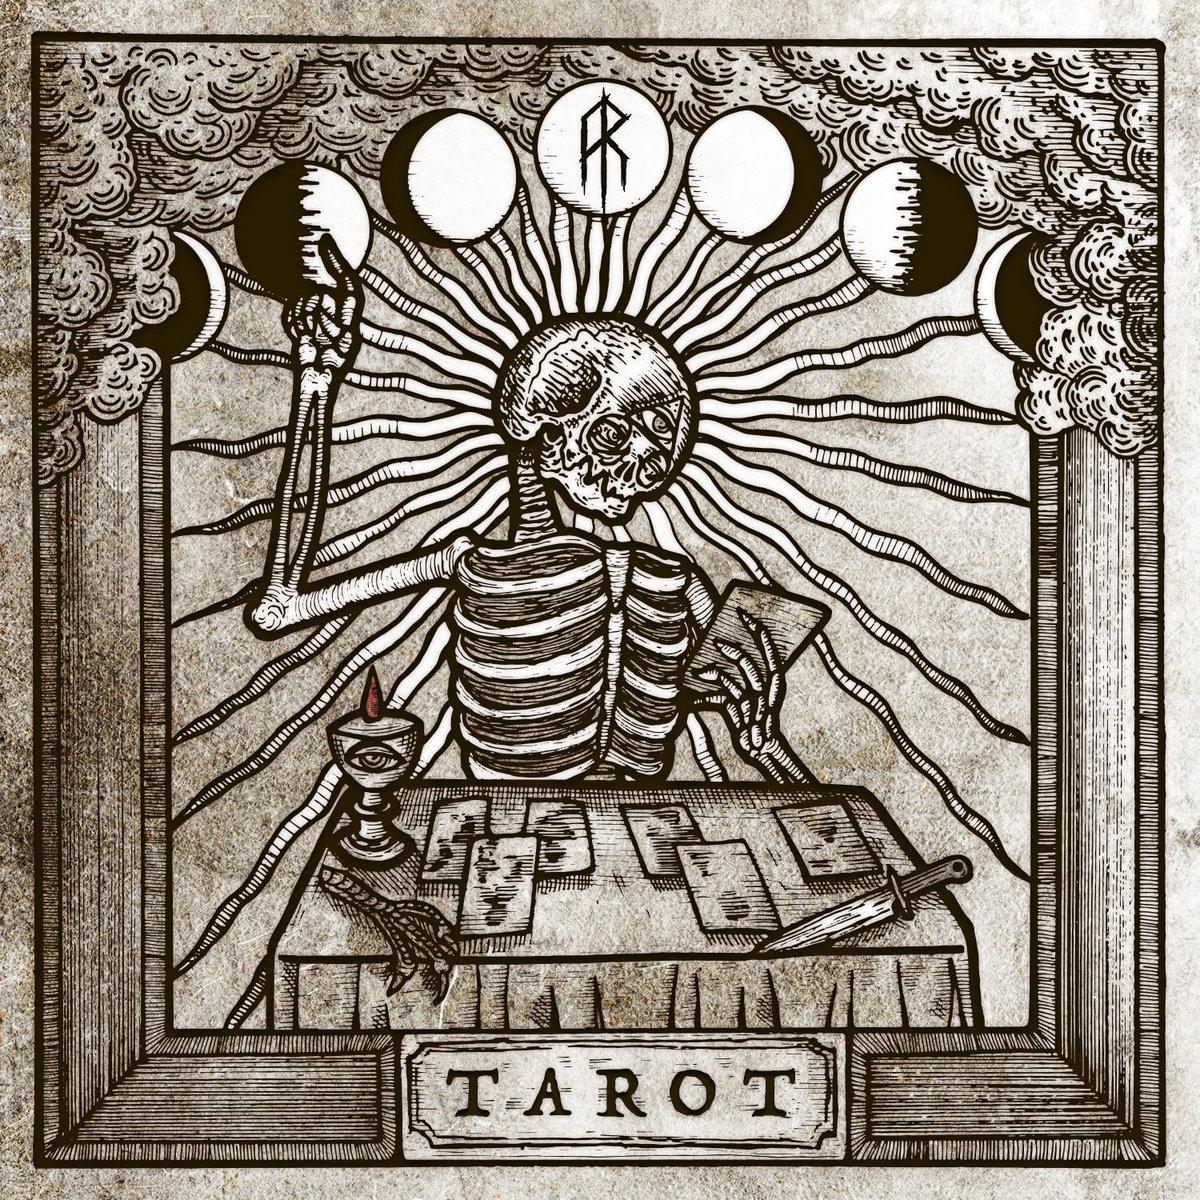 aether realm tarot album art by kola hari